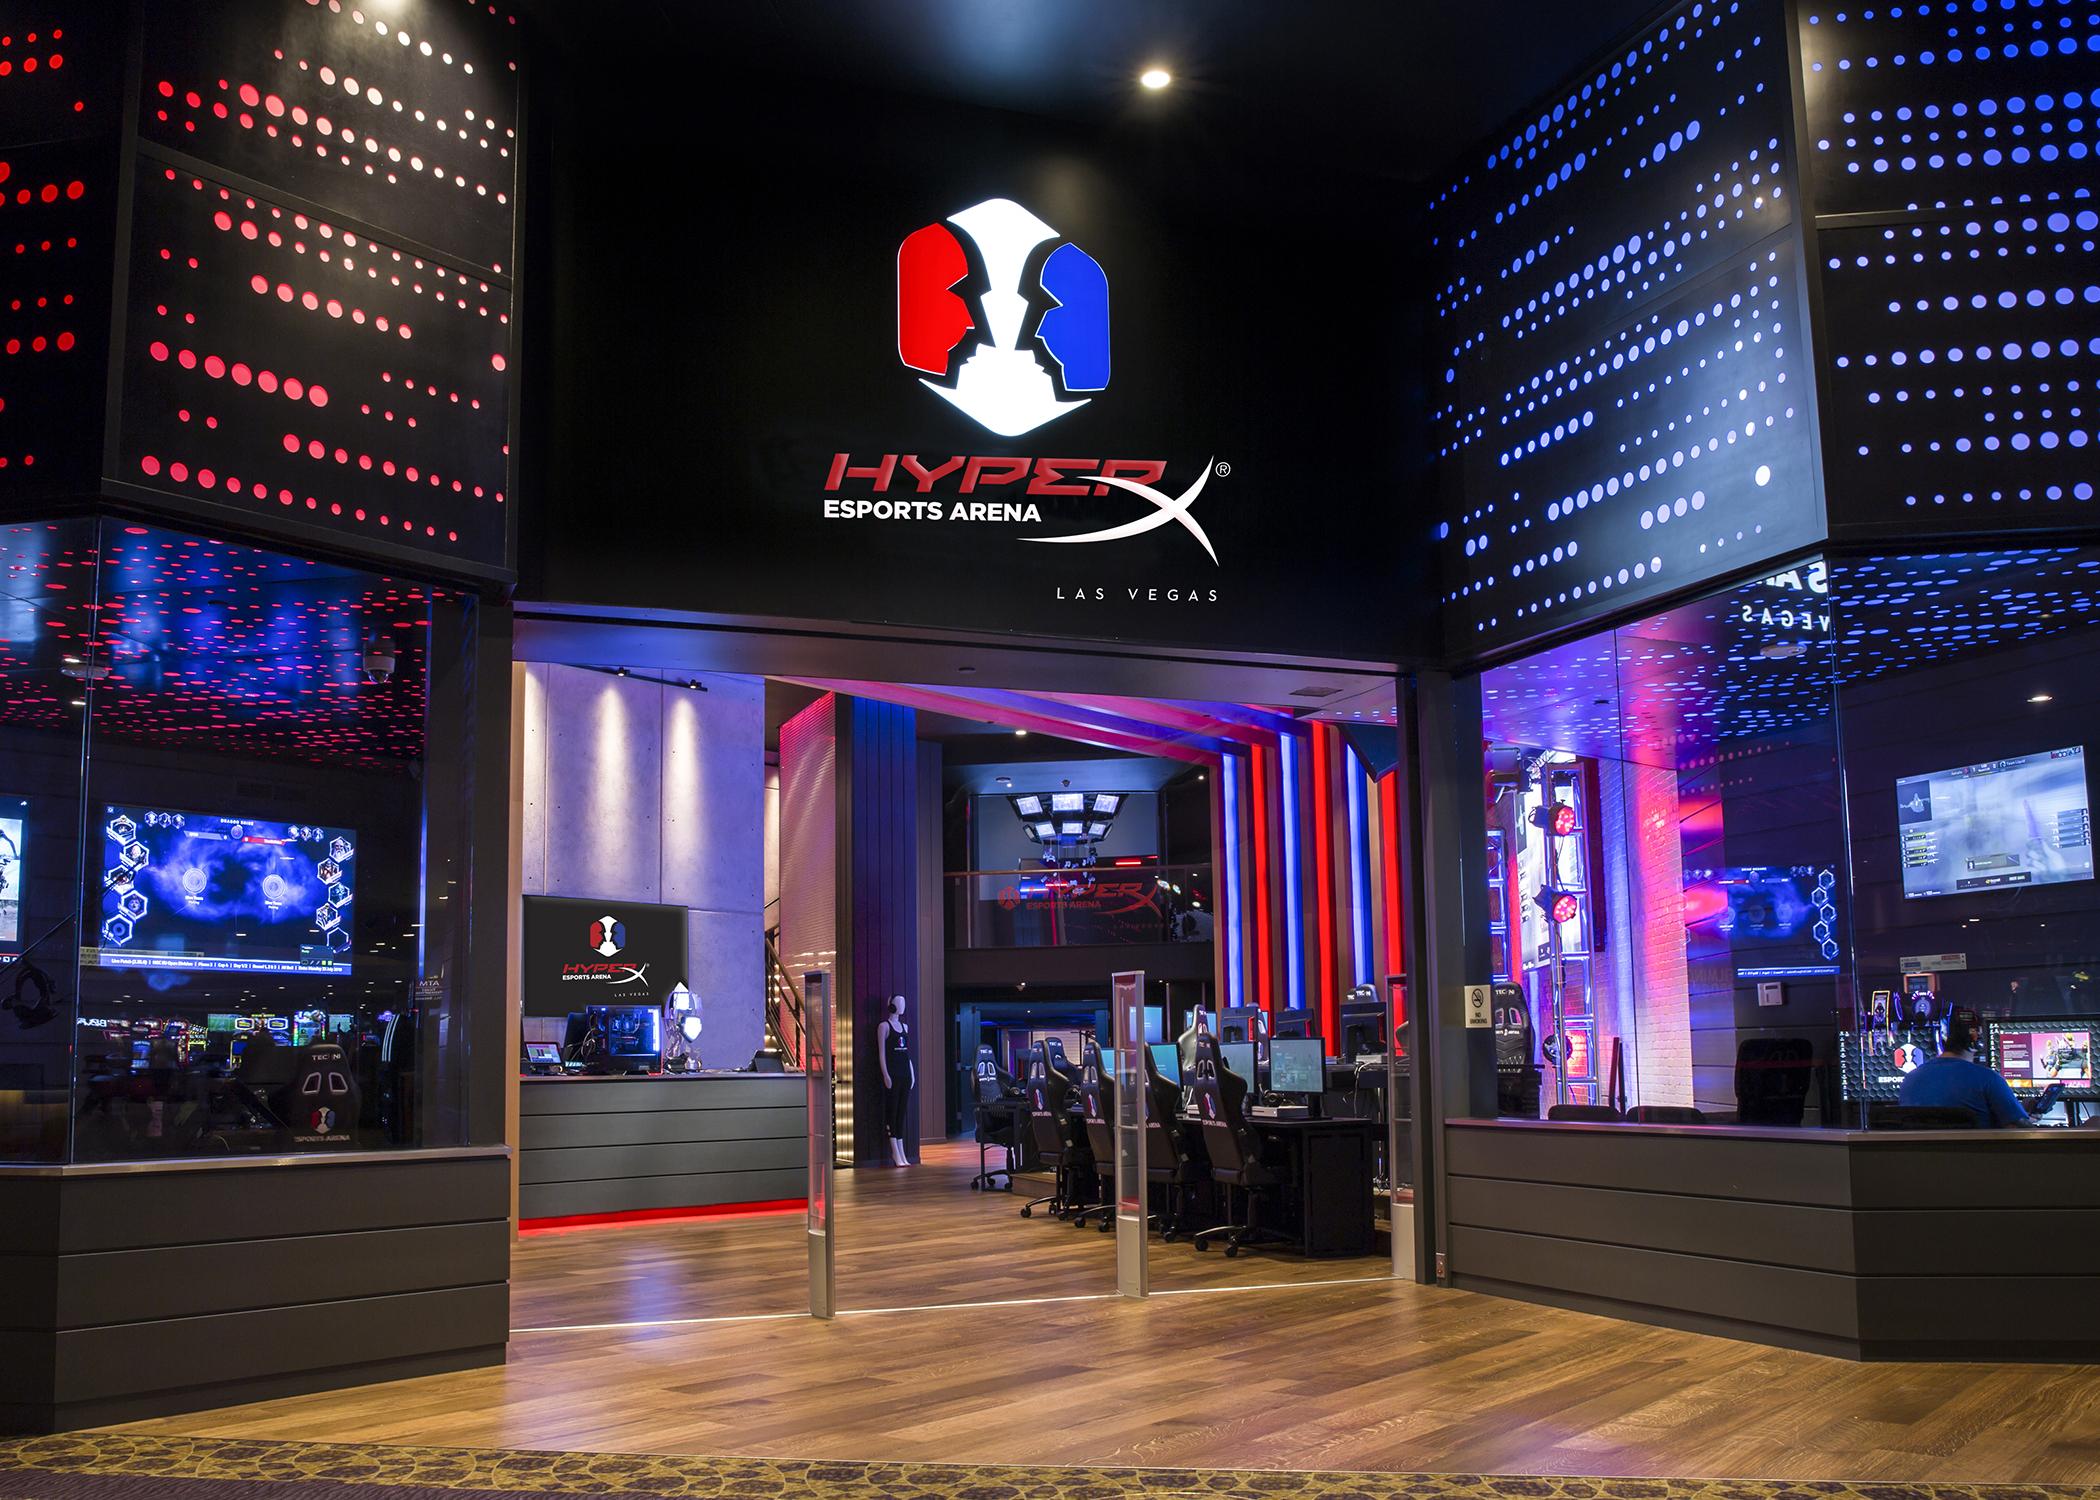 New for 2018: HyperX Esports Arena Las Vegas - Arena Digest